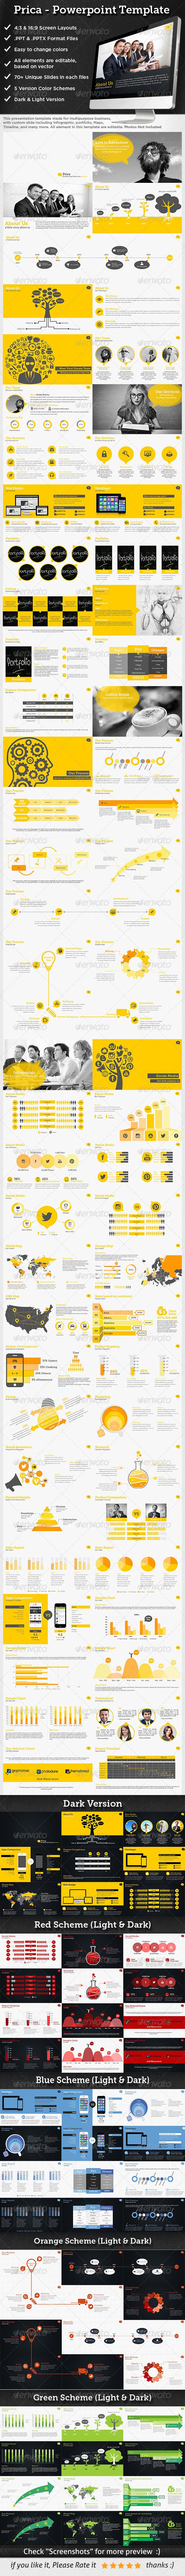 GraphicRiver Prica Presentation Powerpoint Template 8594950